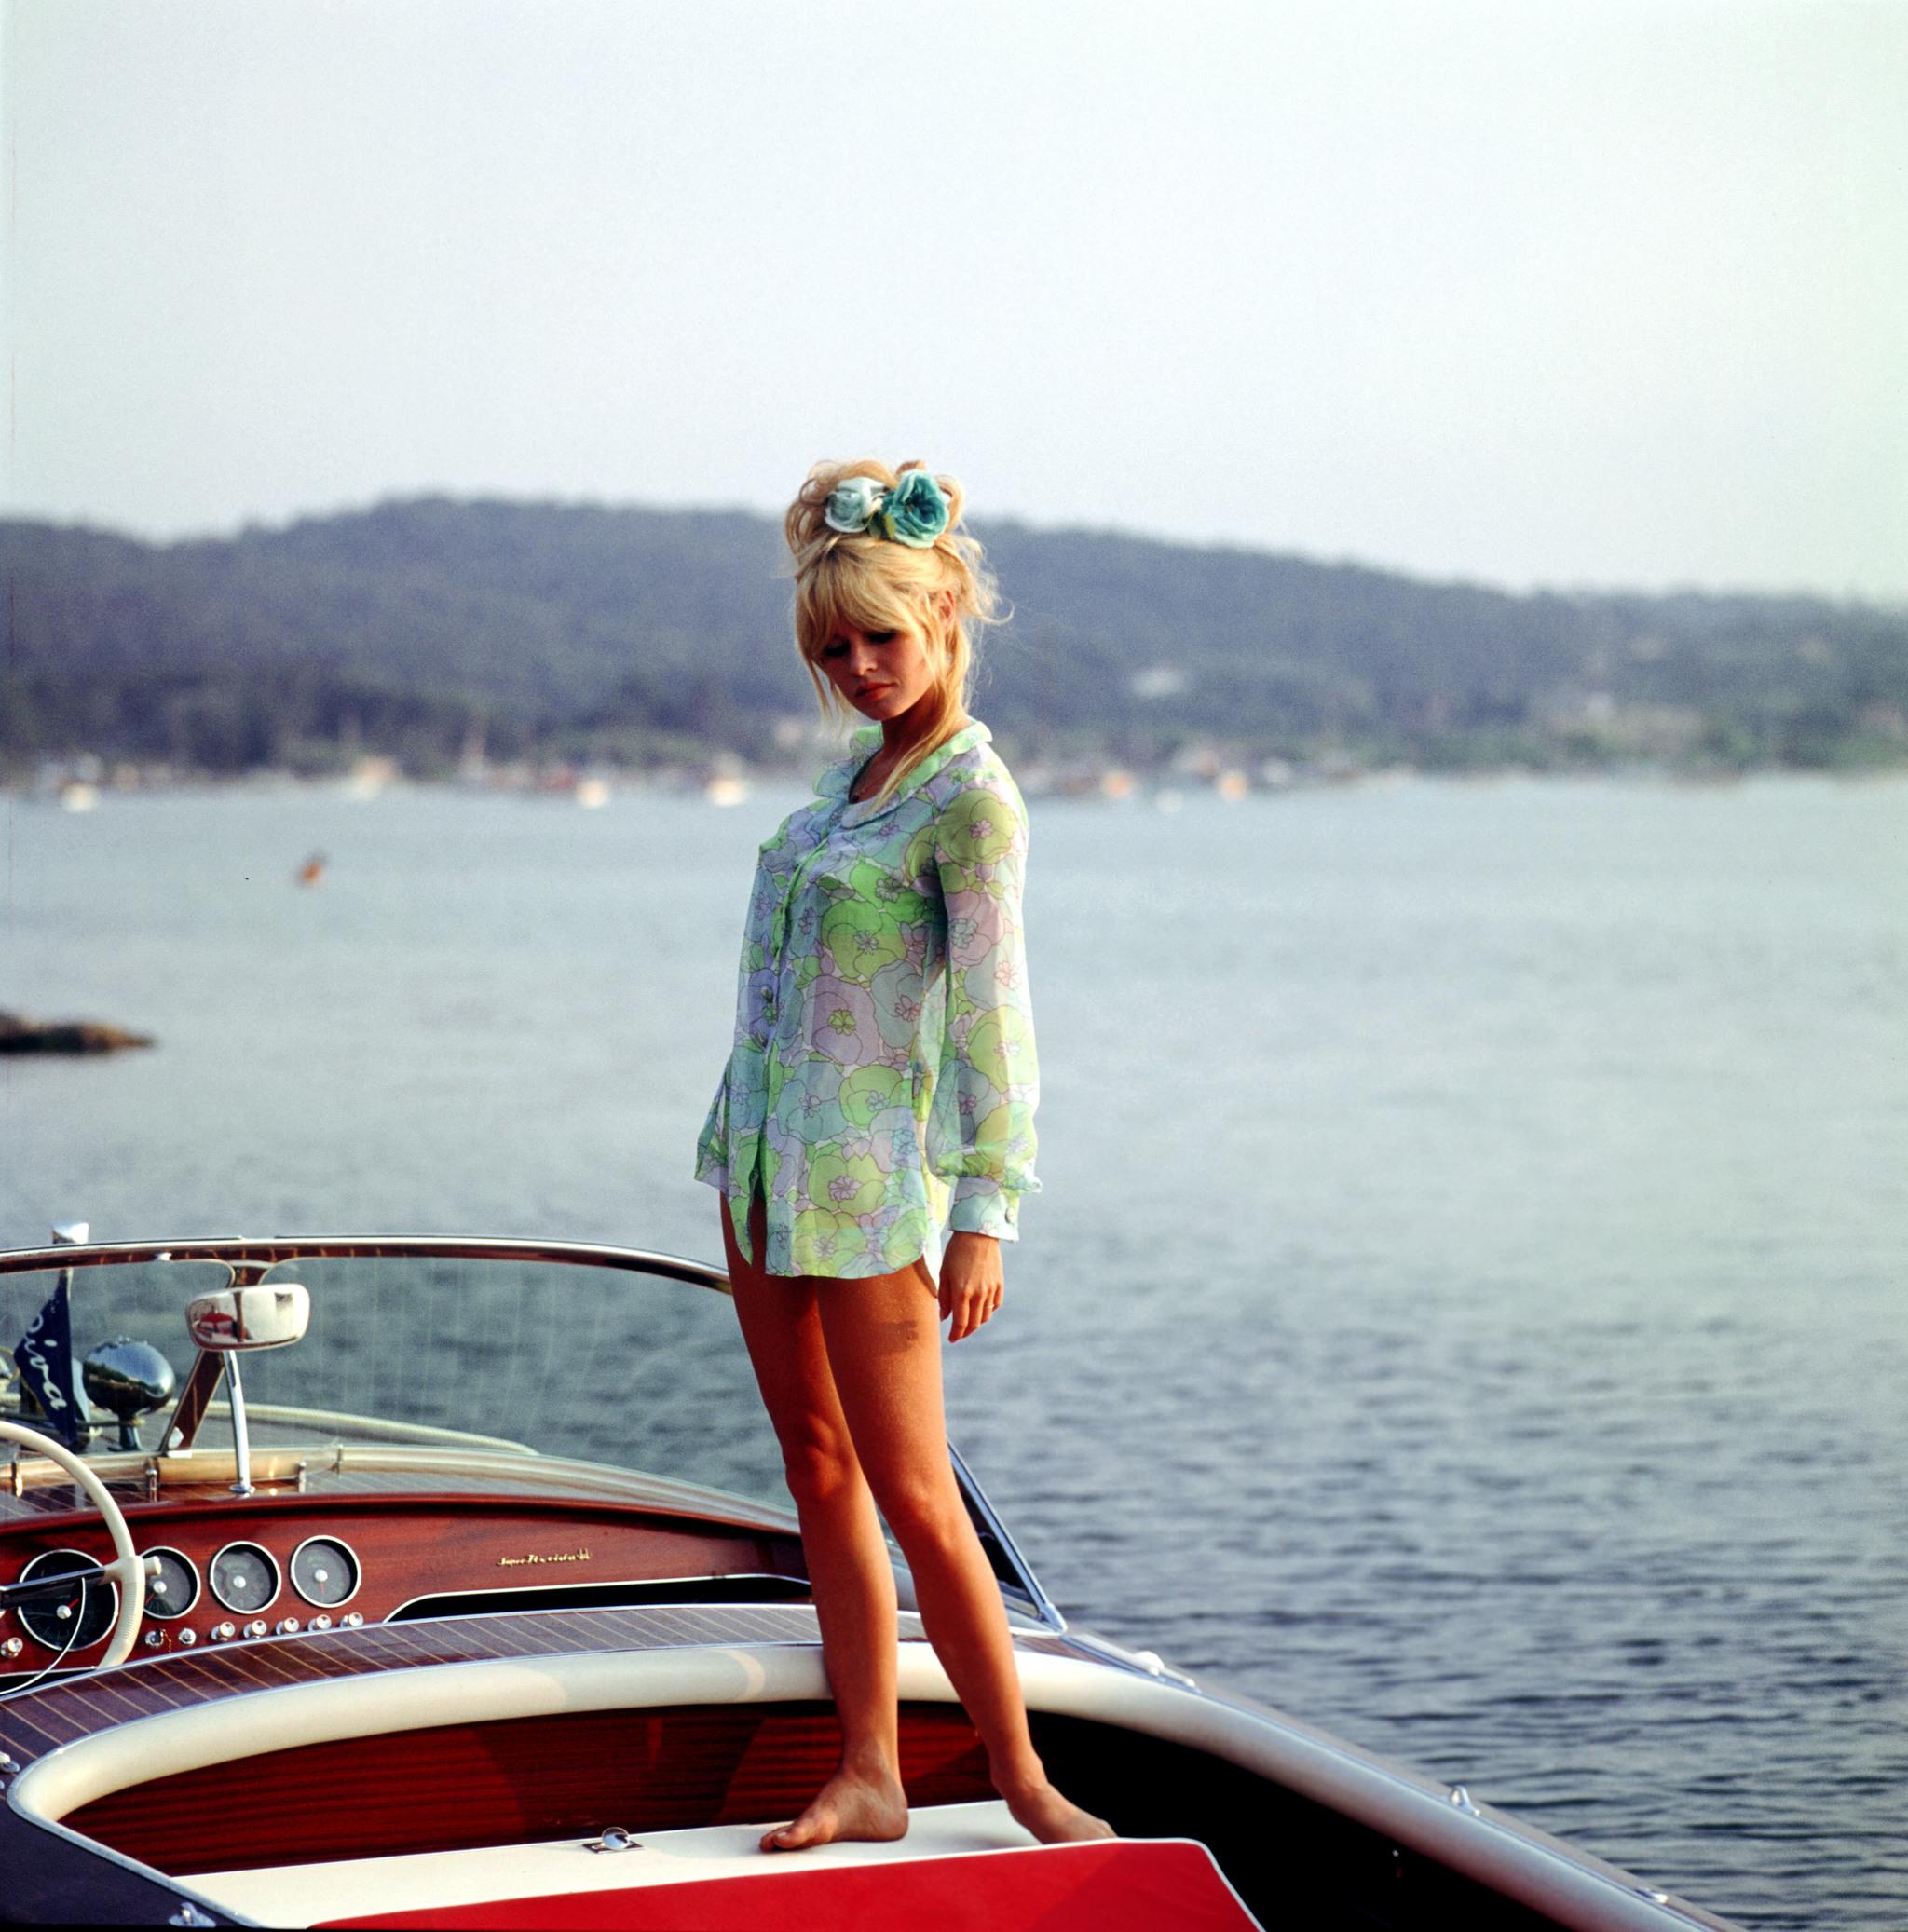 Brigitte Bardot en 1962  en Saint-Tropez, France.